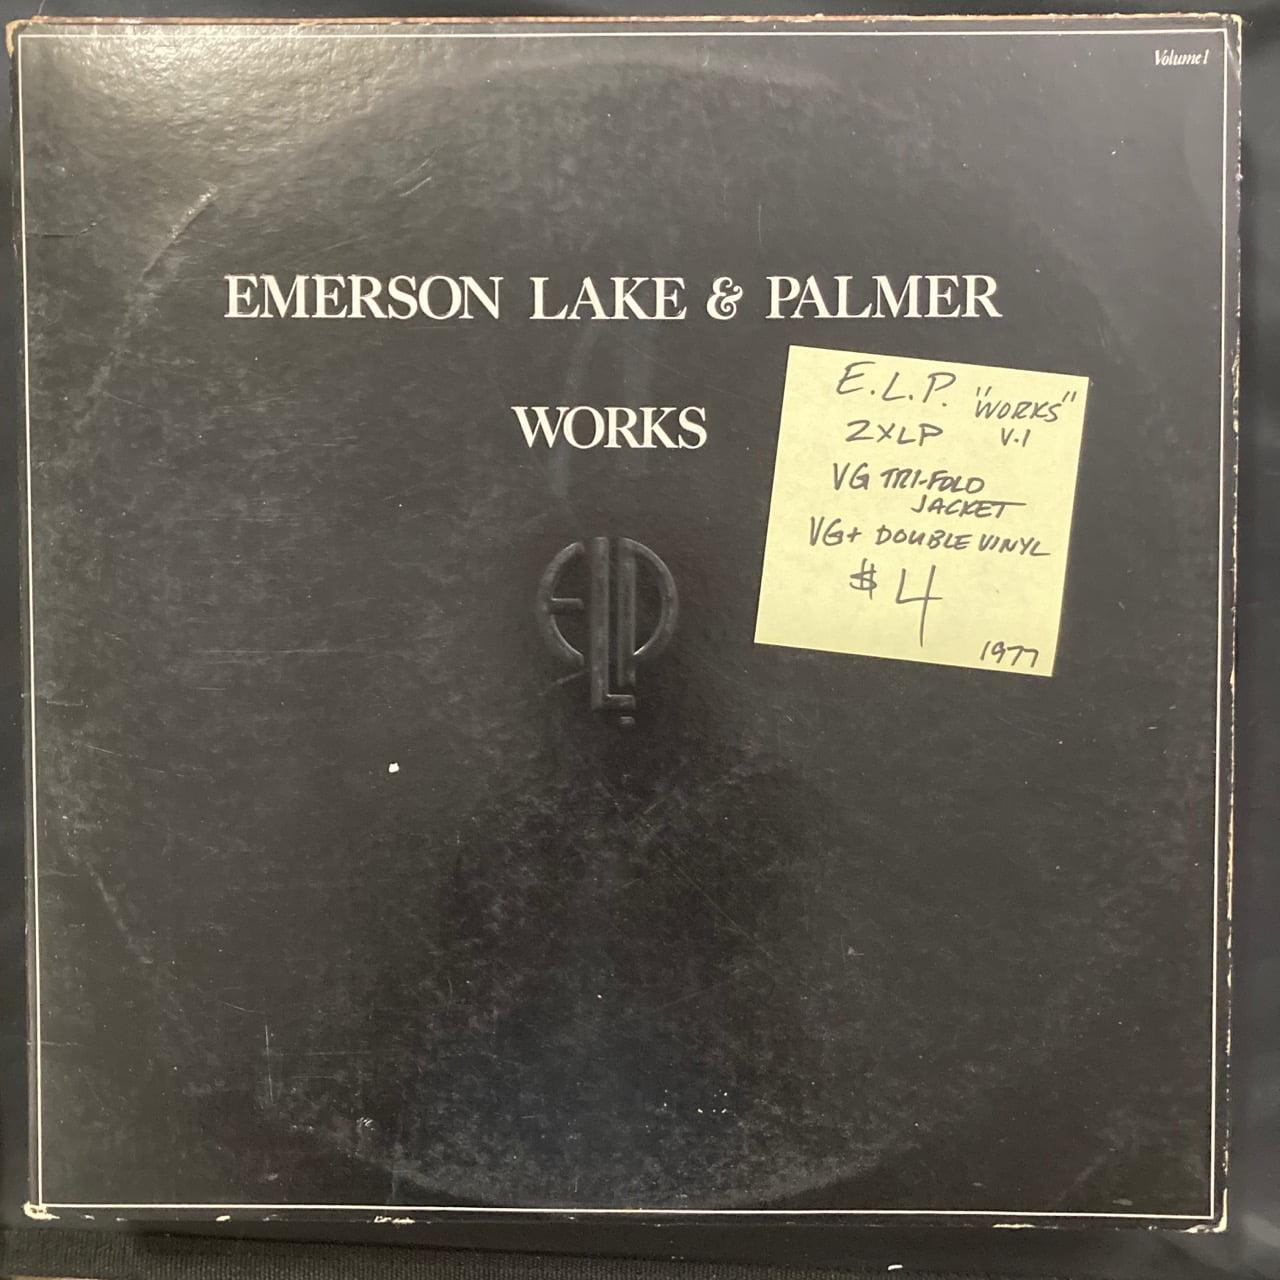 Emerson Lake and Palmer vinyl